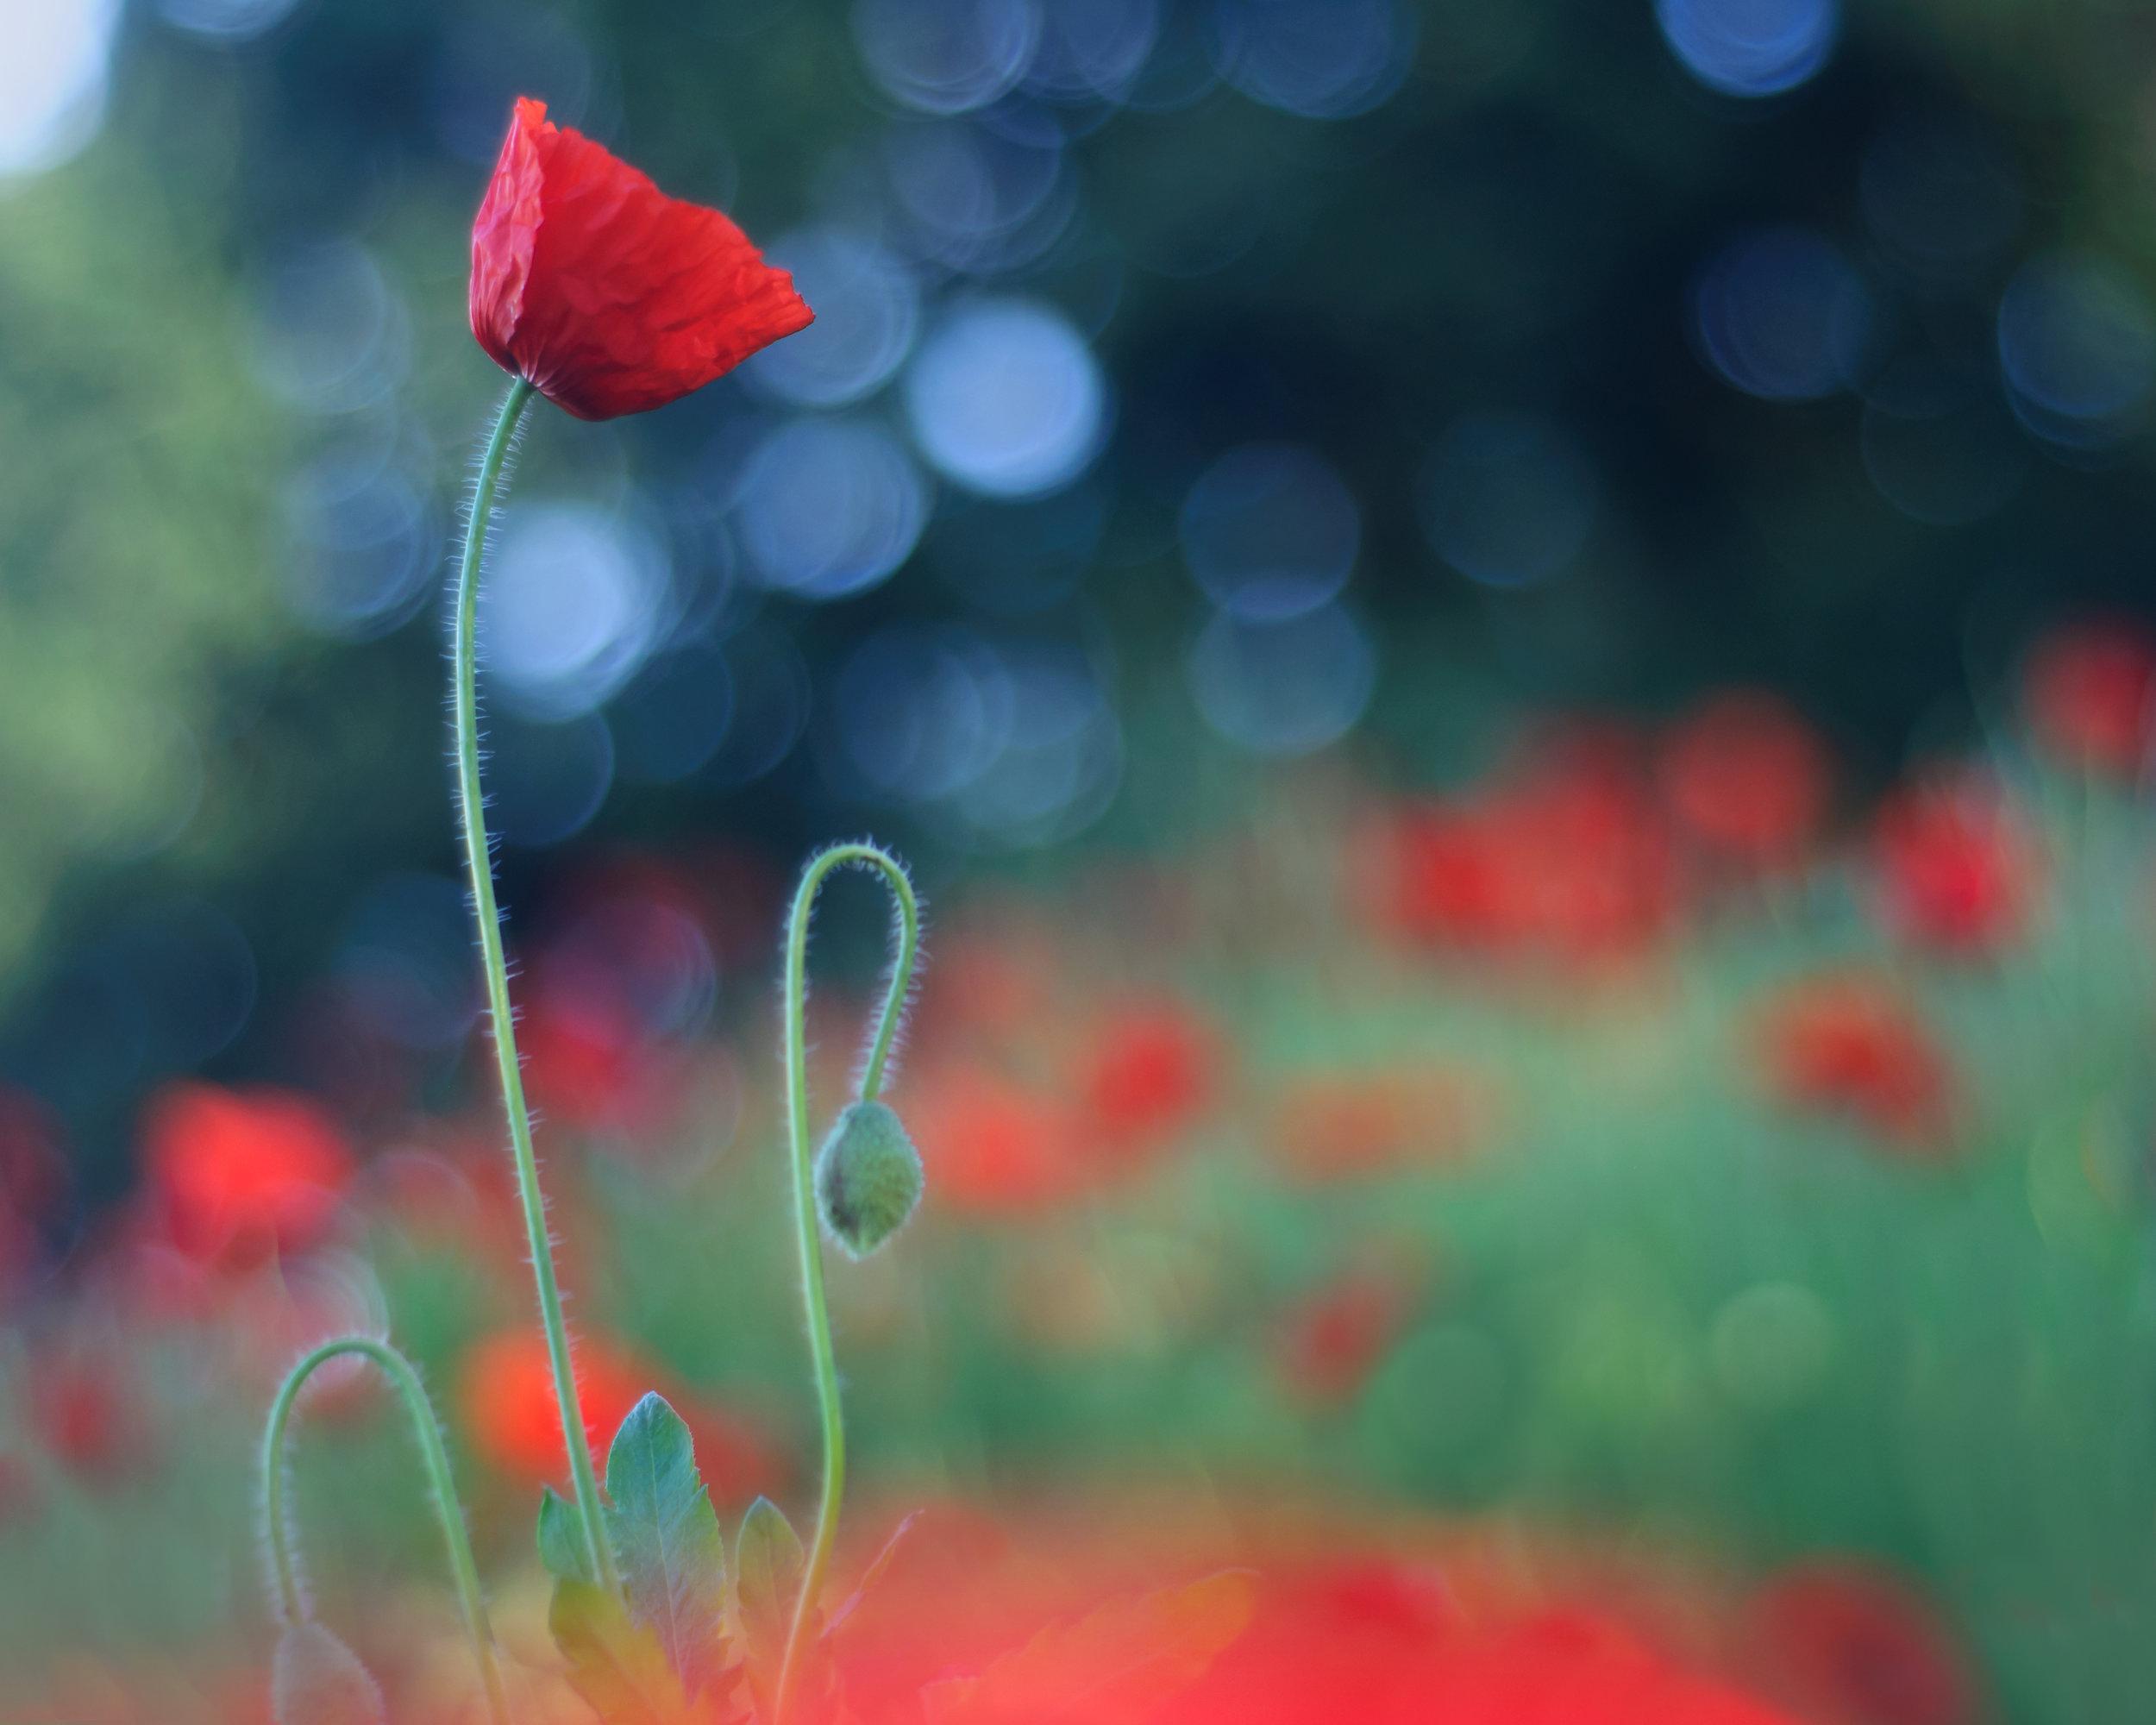 Ida_Hollis_Photography_Nature041.jpg